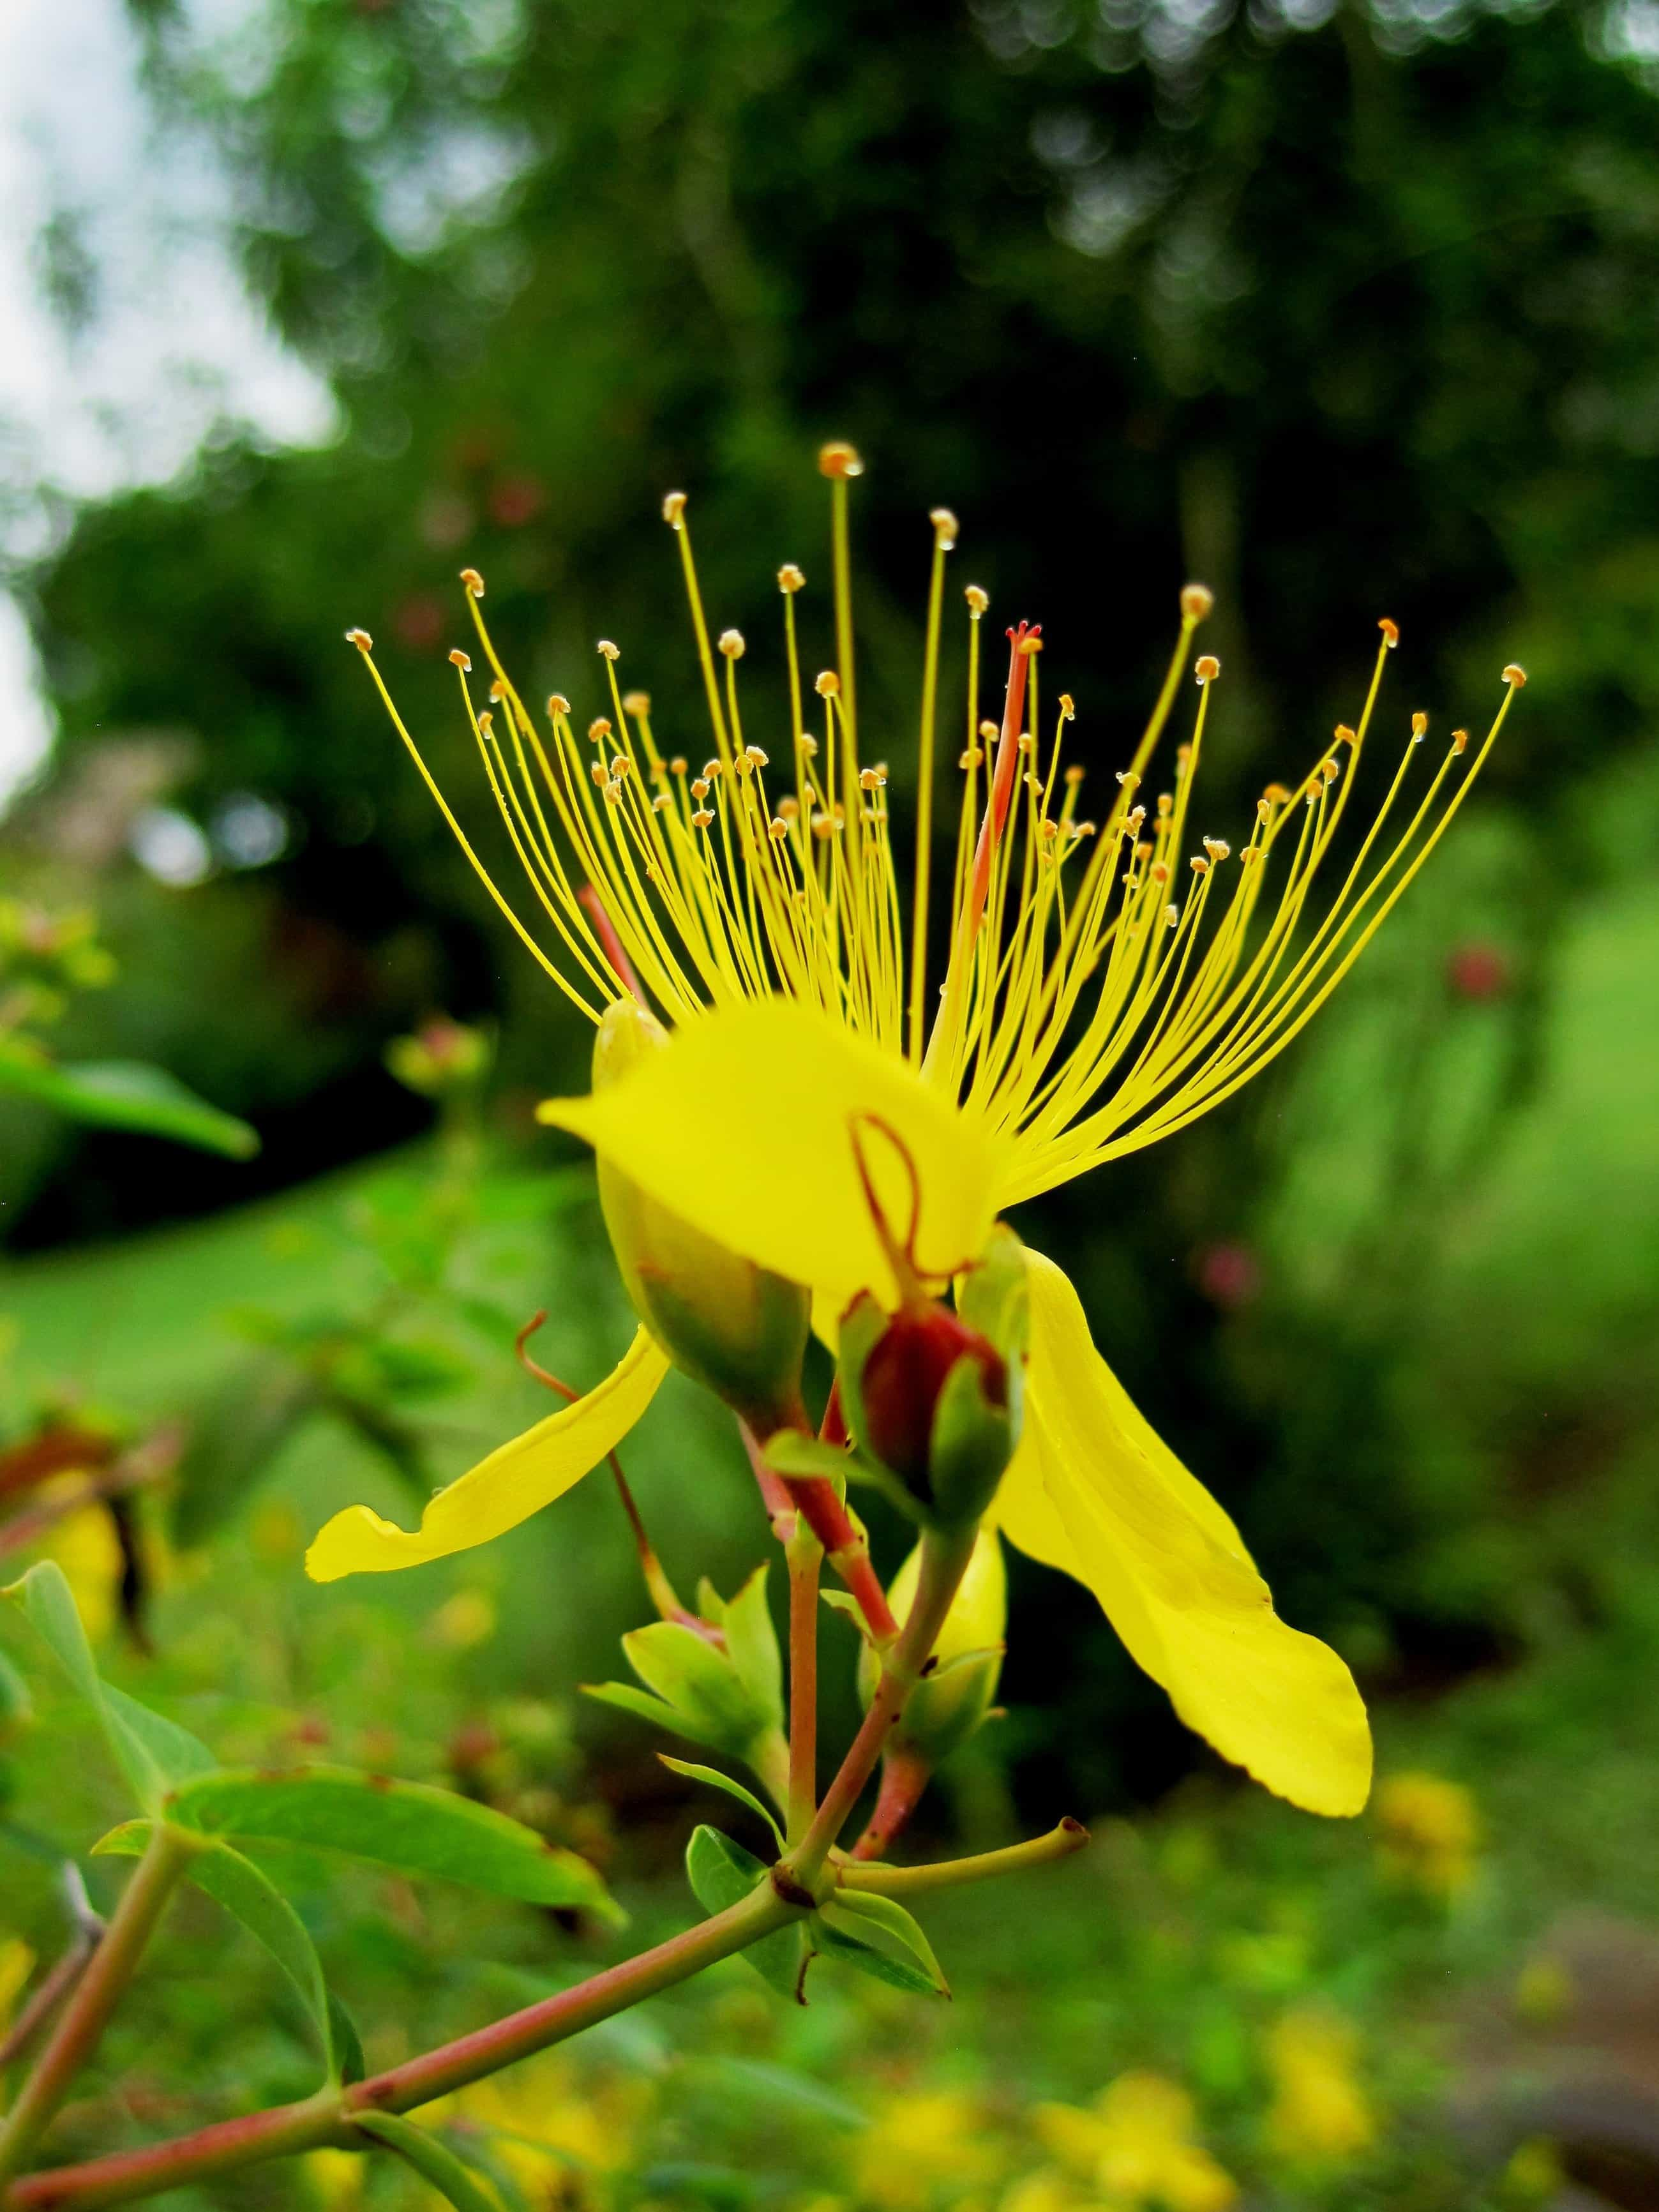 Imagen Gratis Naturaleza Flores Exoticas Jardin Flora Hoja